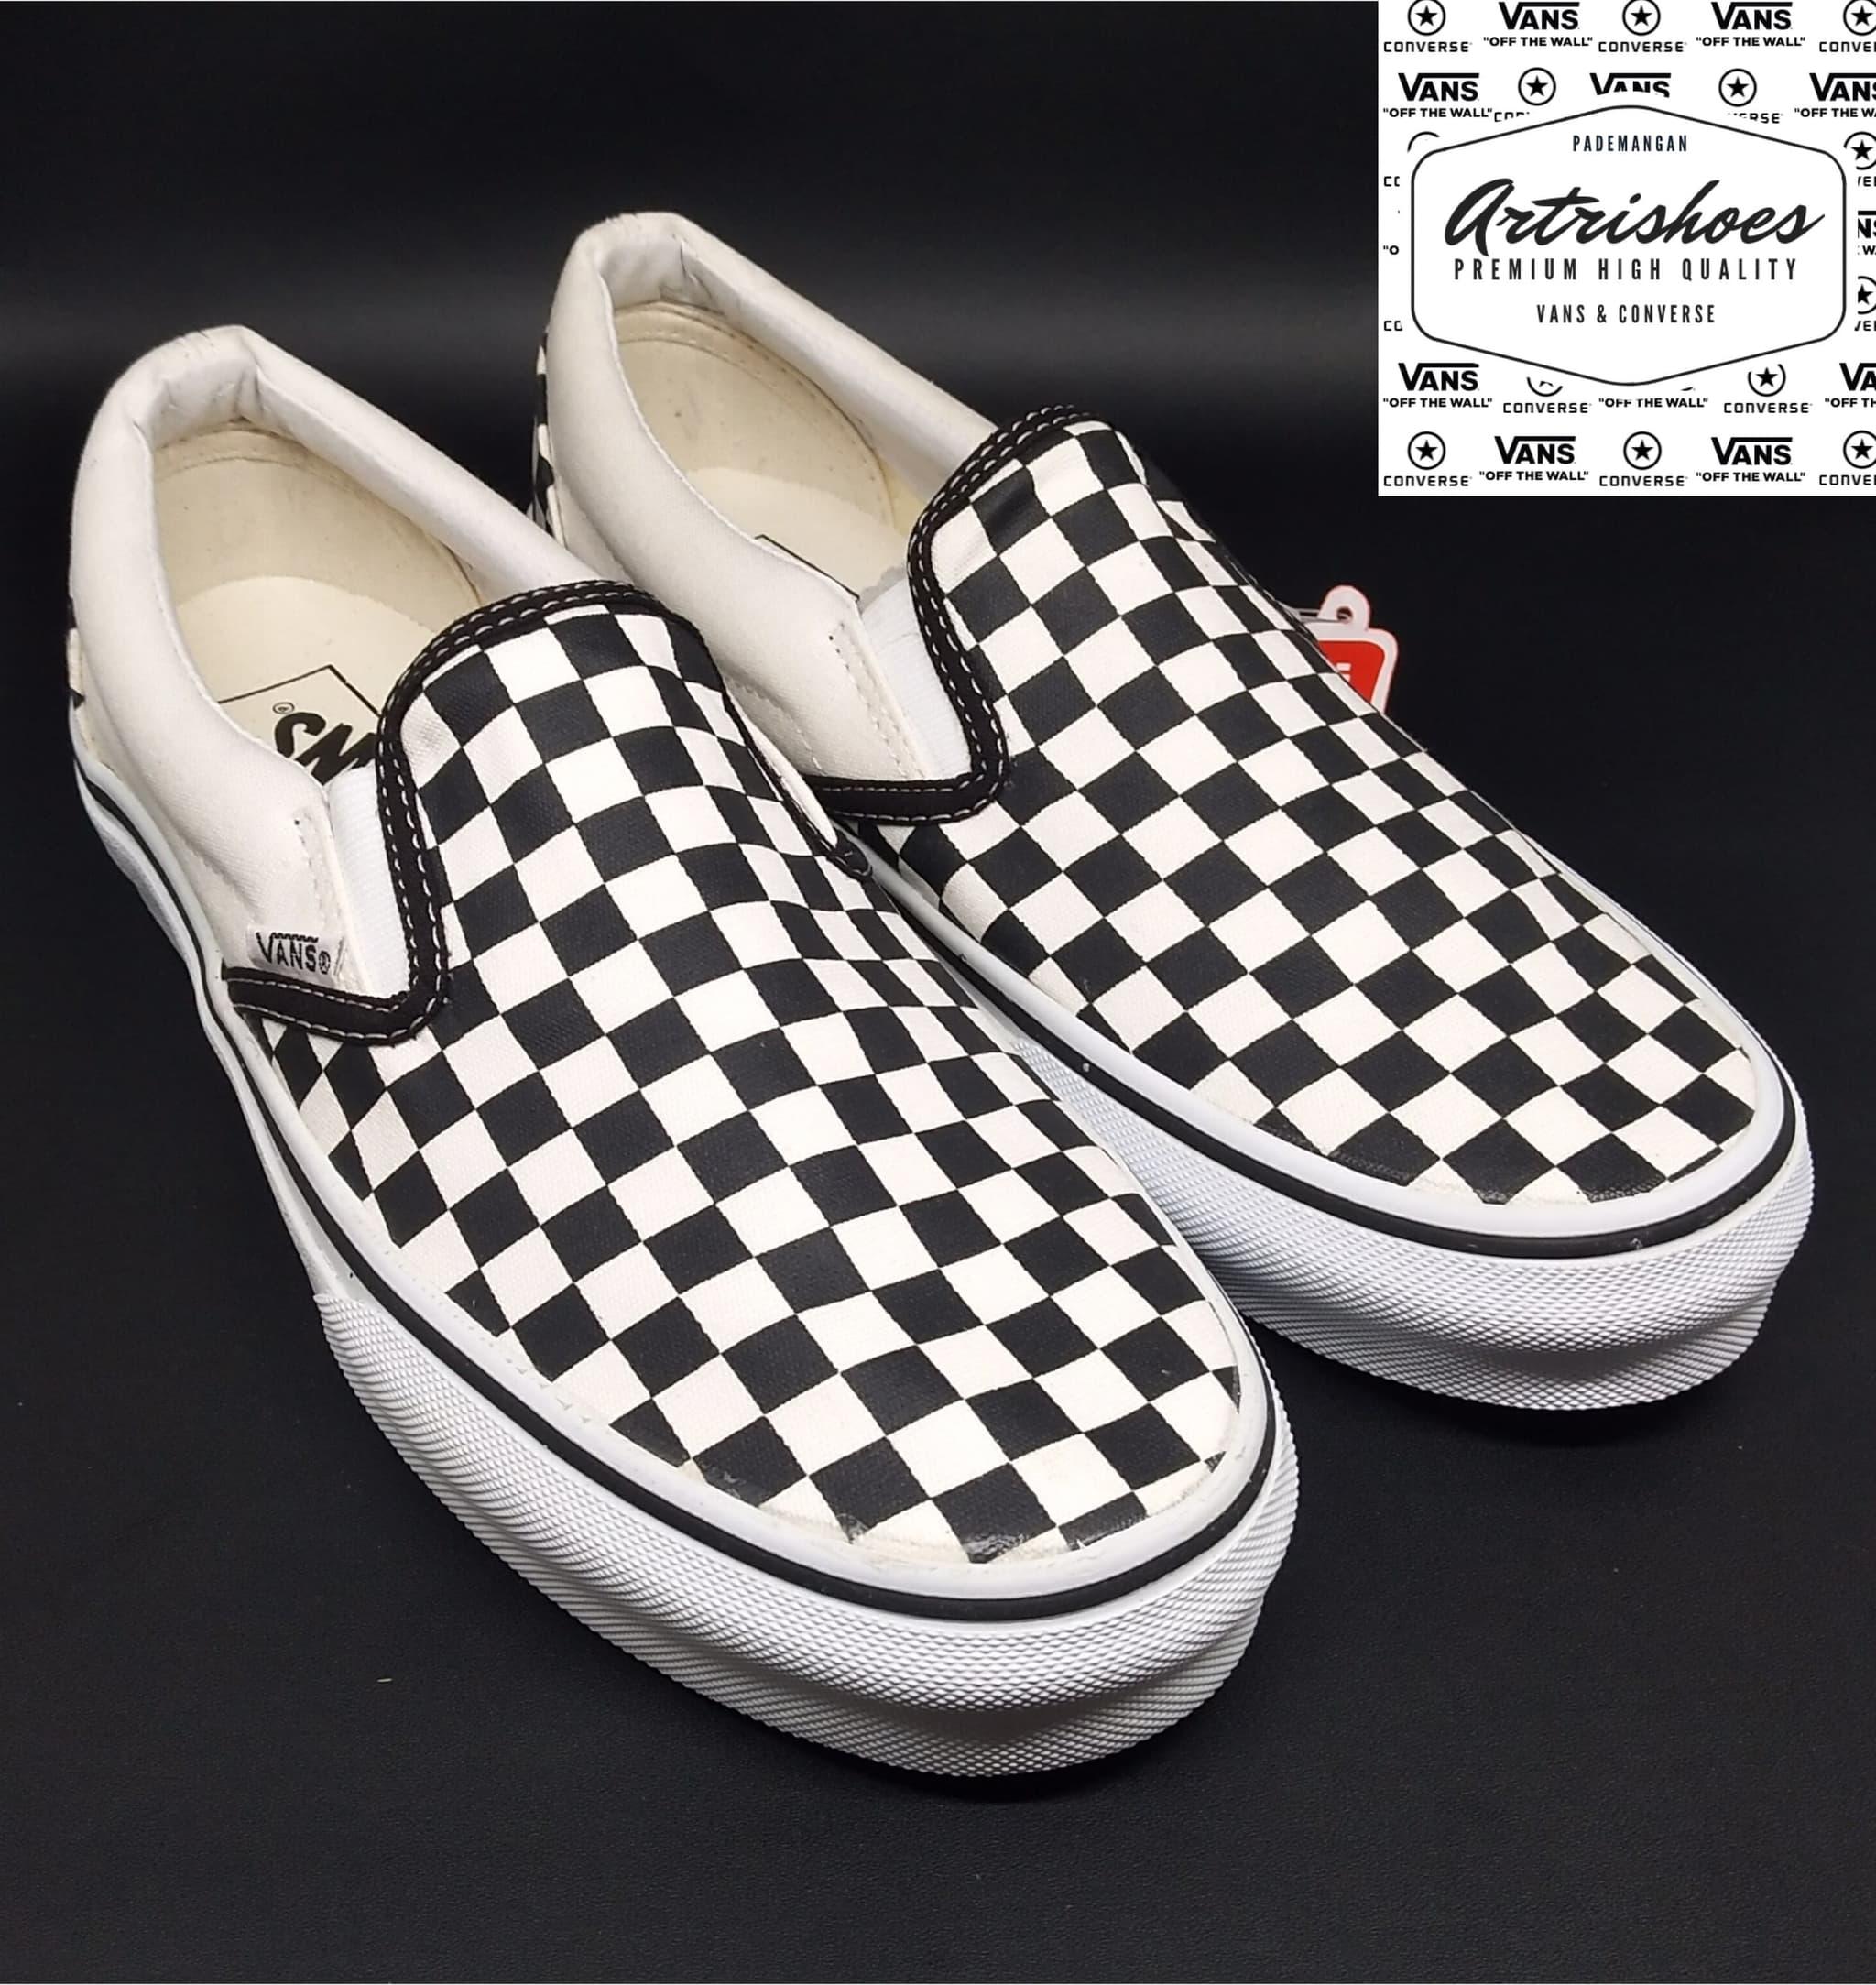 Jual Vans Slip on Checkerboard Black White Premium High Quality ... b7b9304a4b